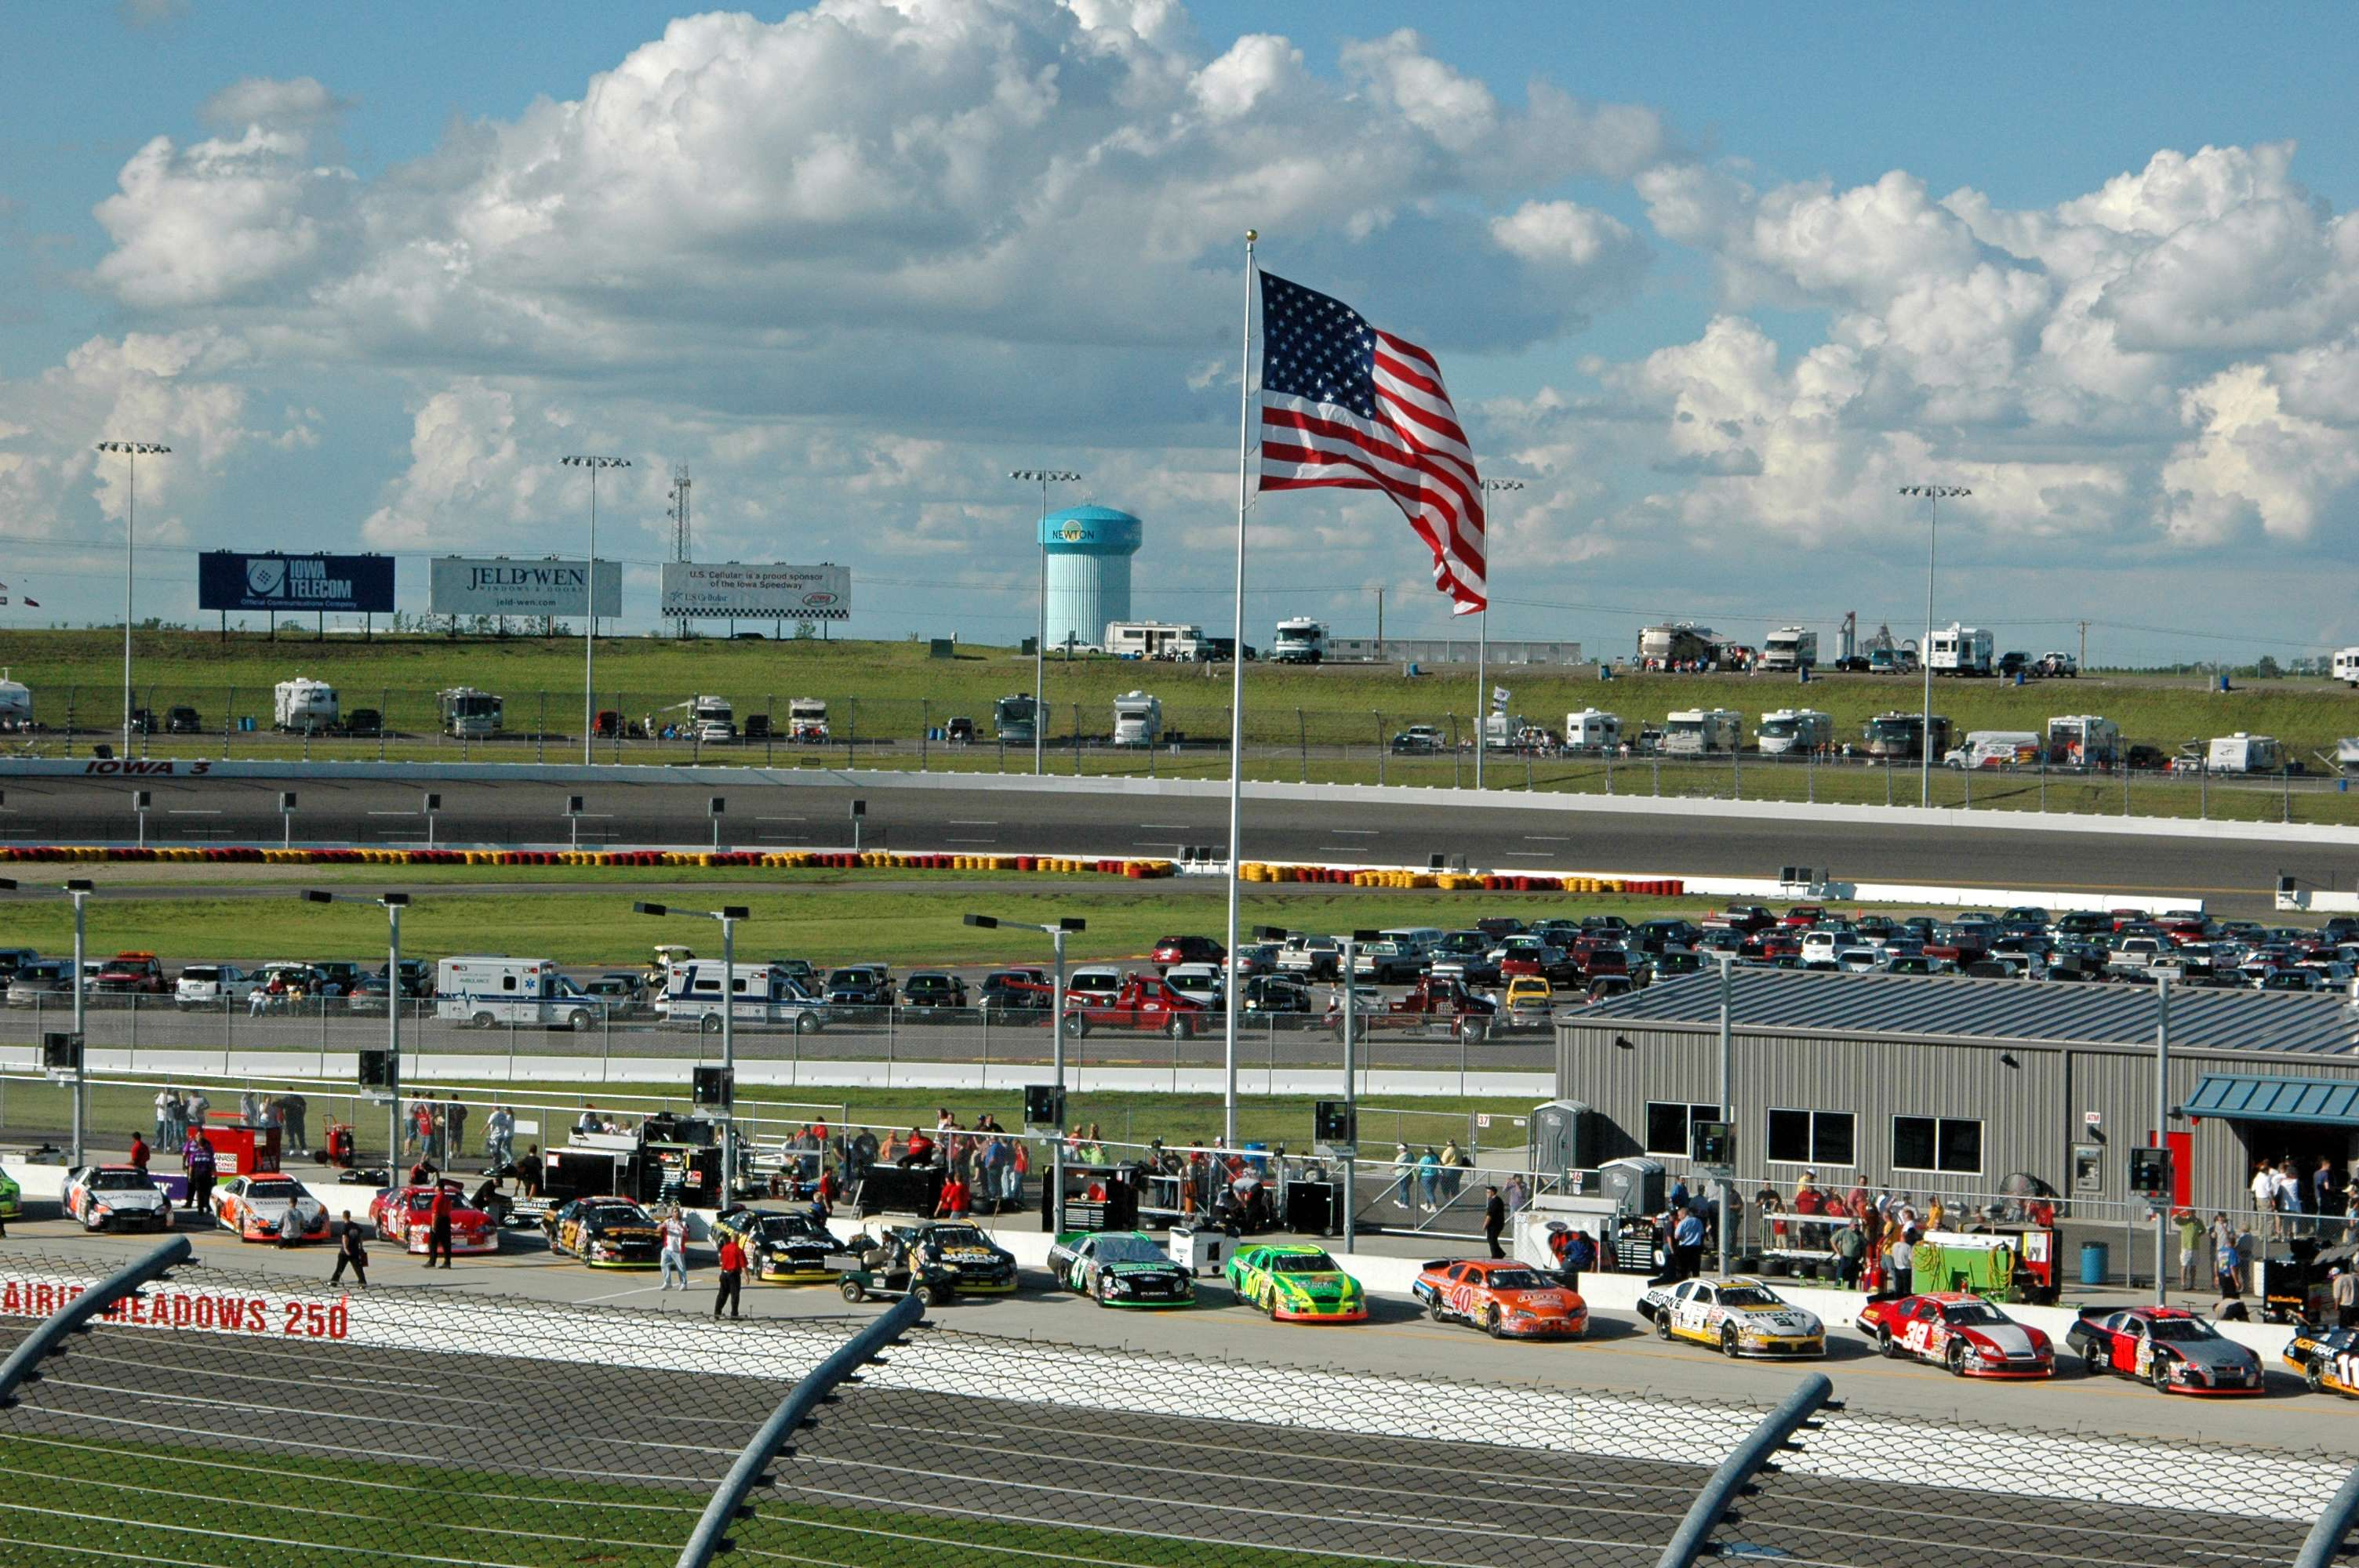 Top 10 Punto Medio Noticias Iowa Speedway Seating